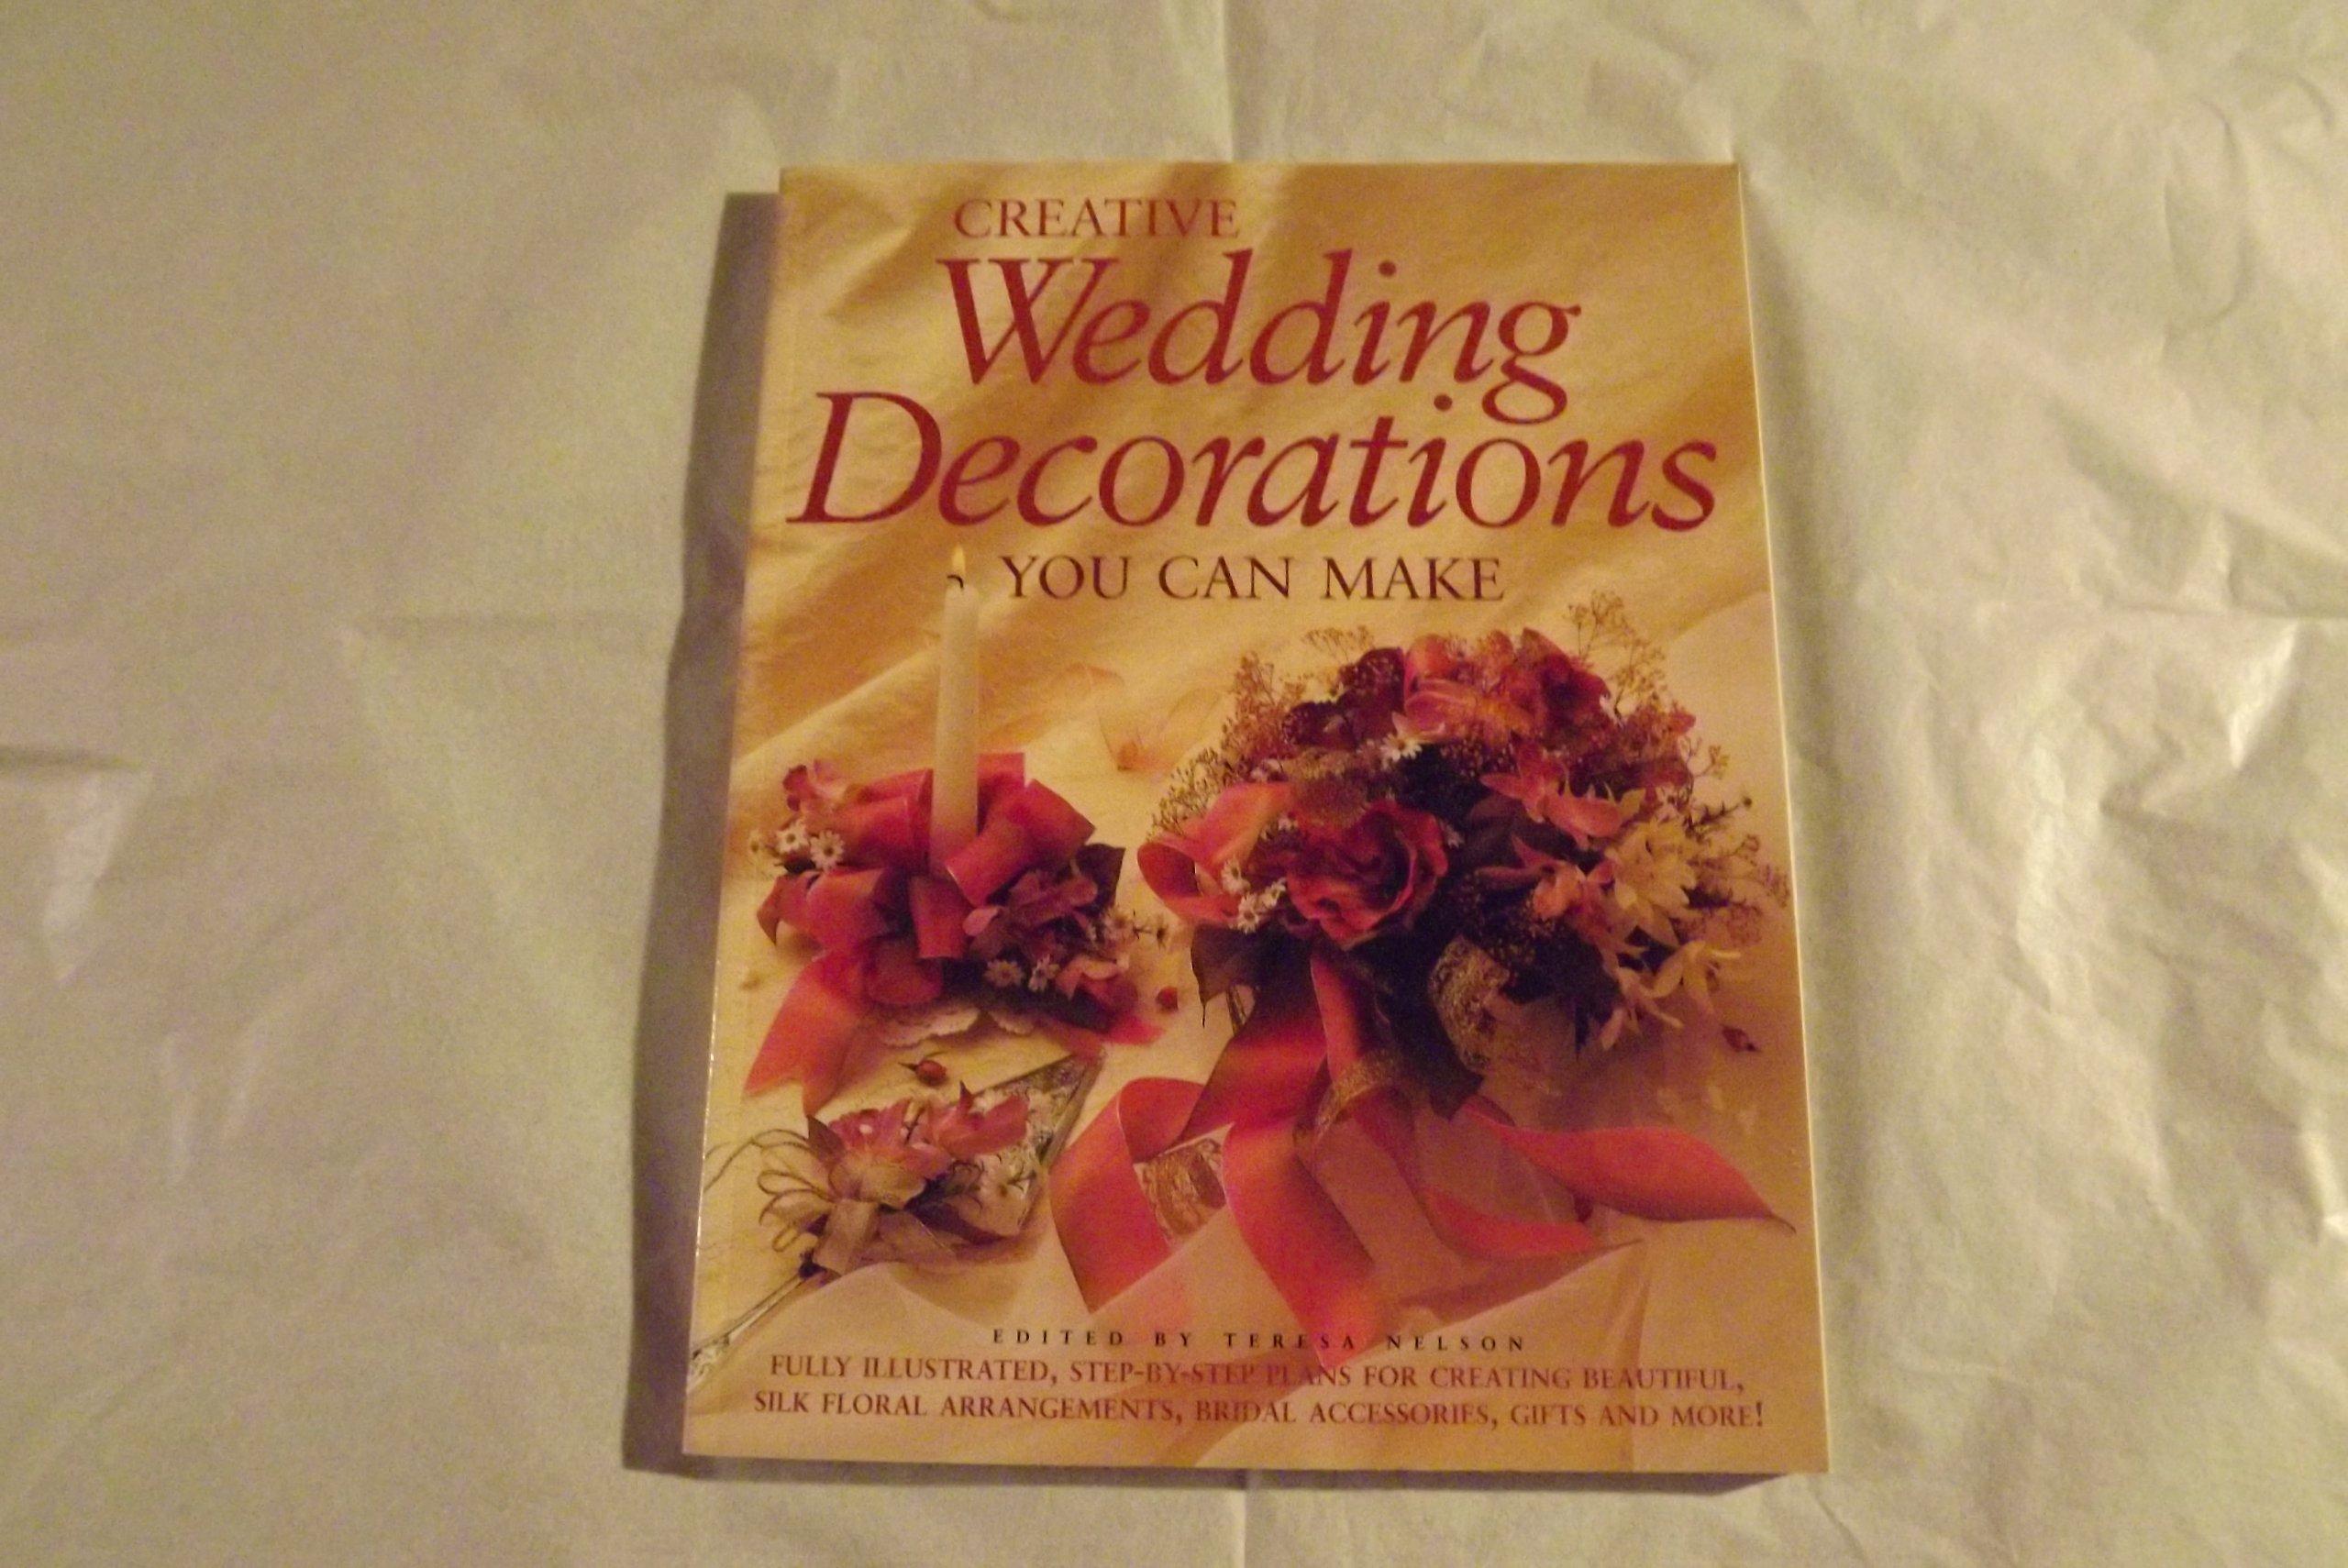 Creative wedding decorations you can make teresa nelson creative wedding decorations you can make teresa nelson 9780756759353 amazon books junglespirit Gallery